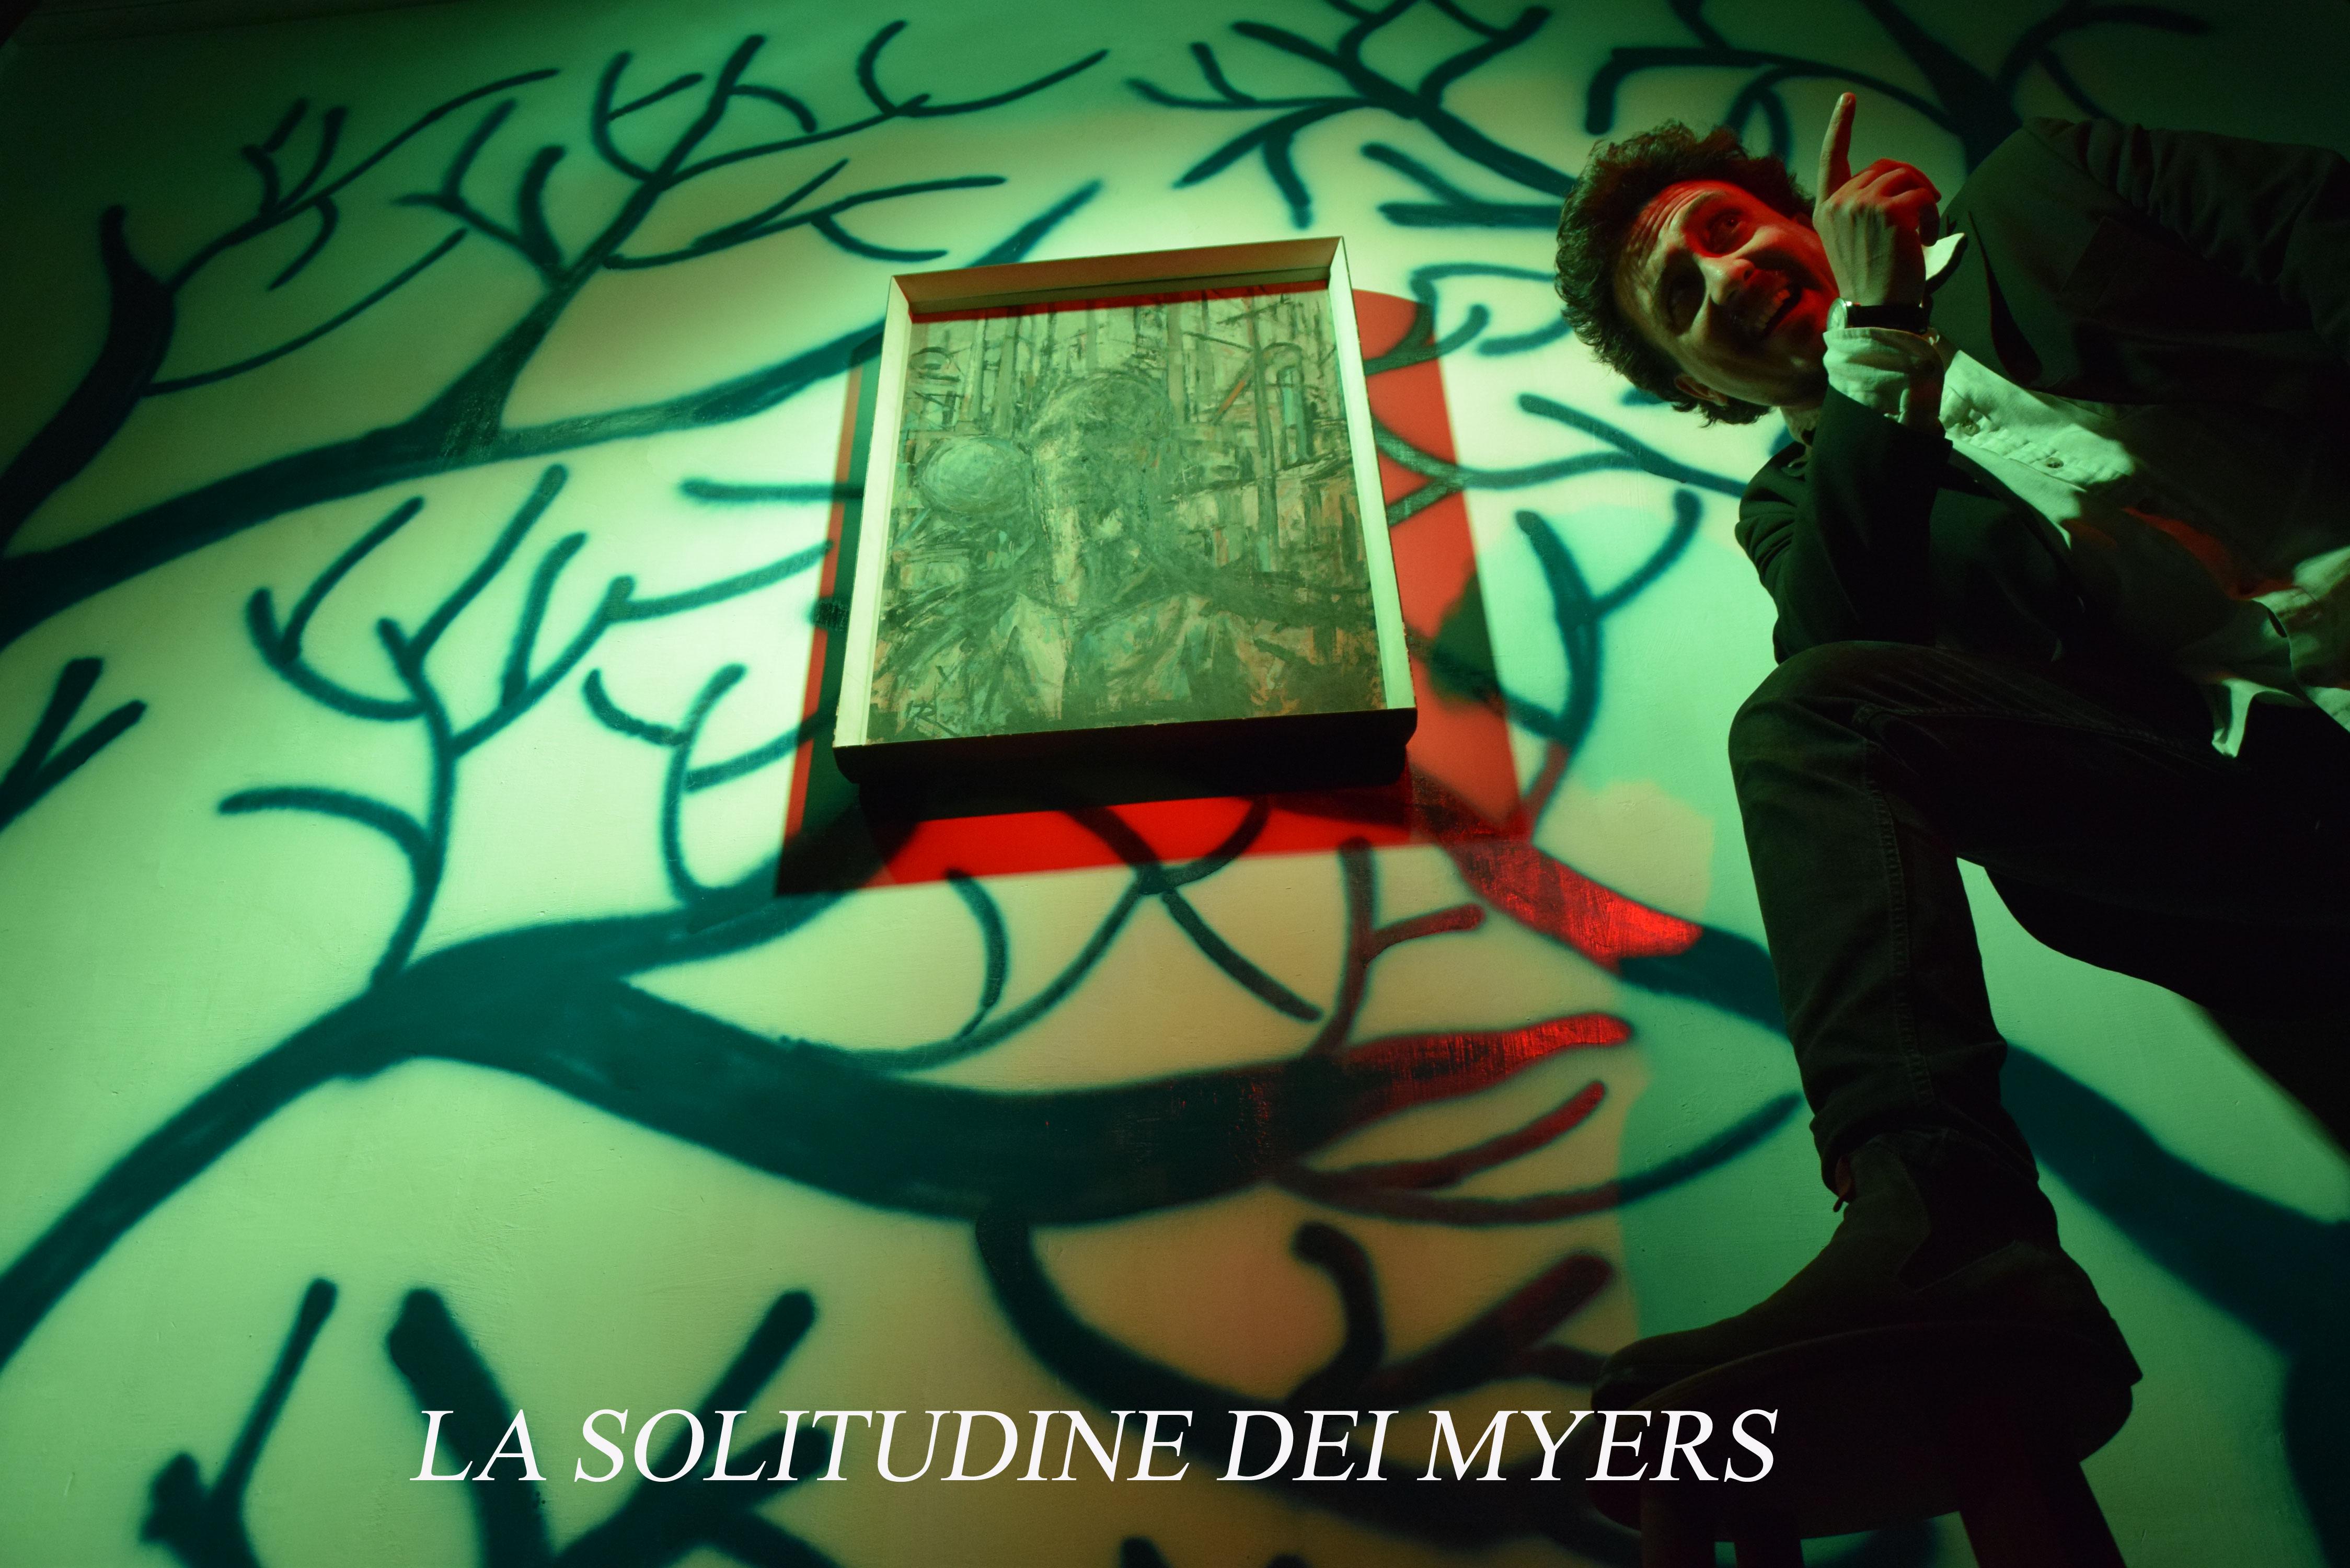 la-solitudine-dei-myers-5